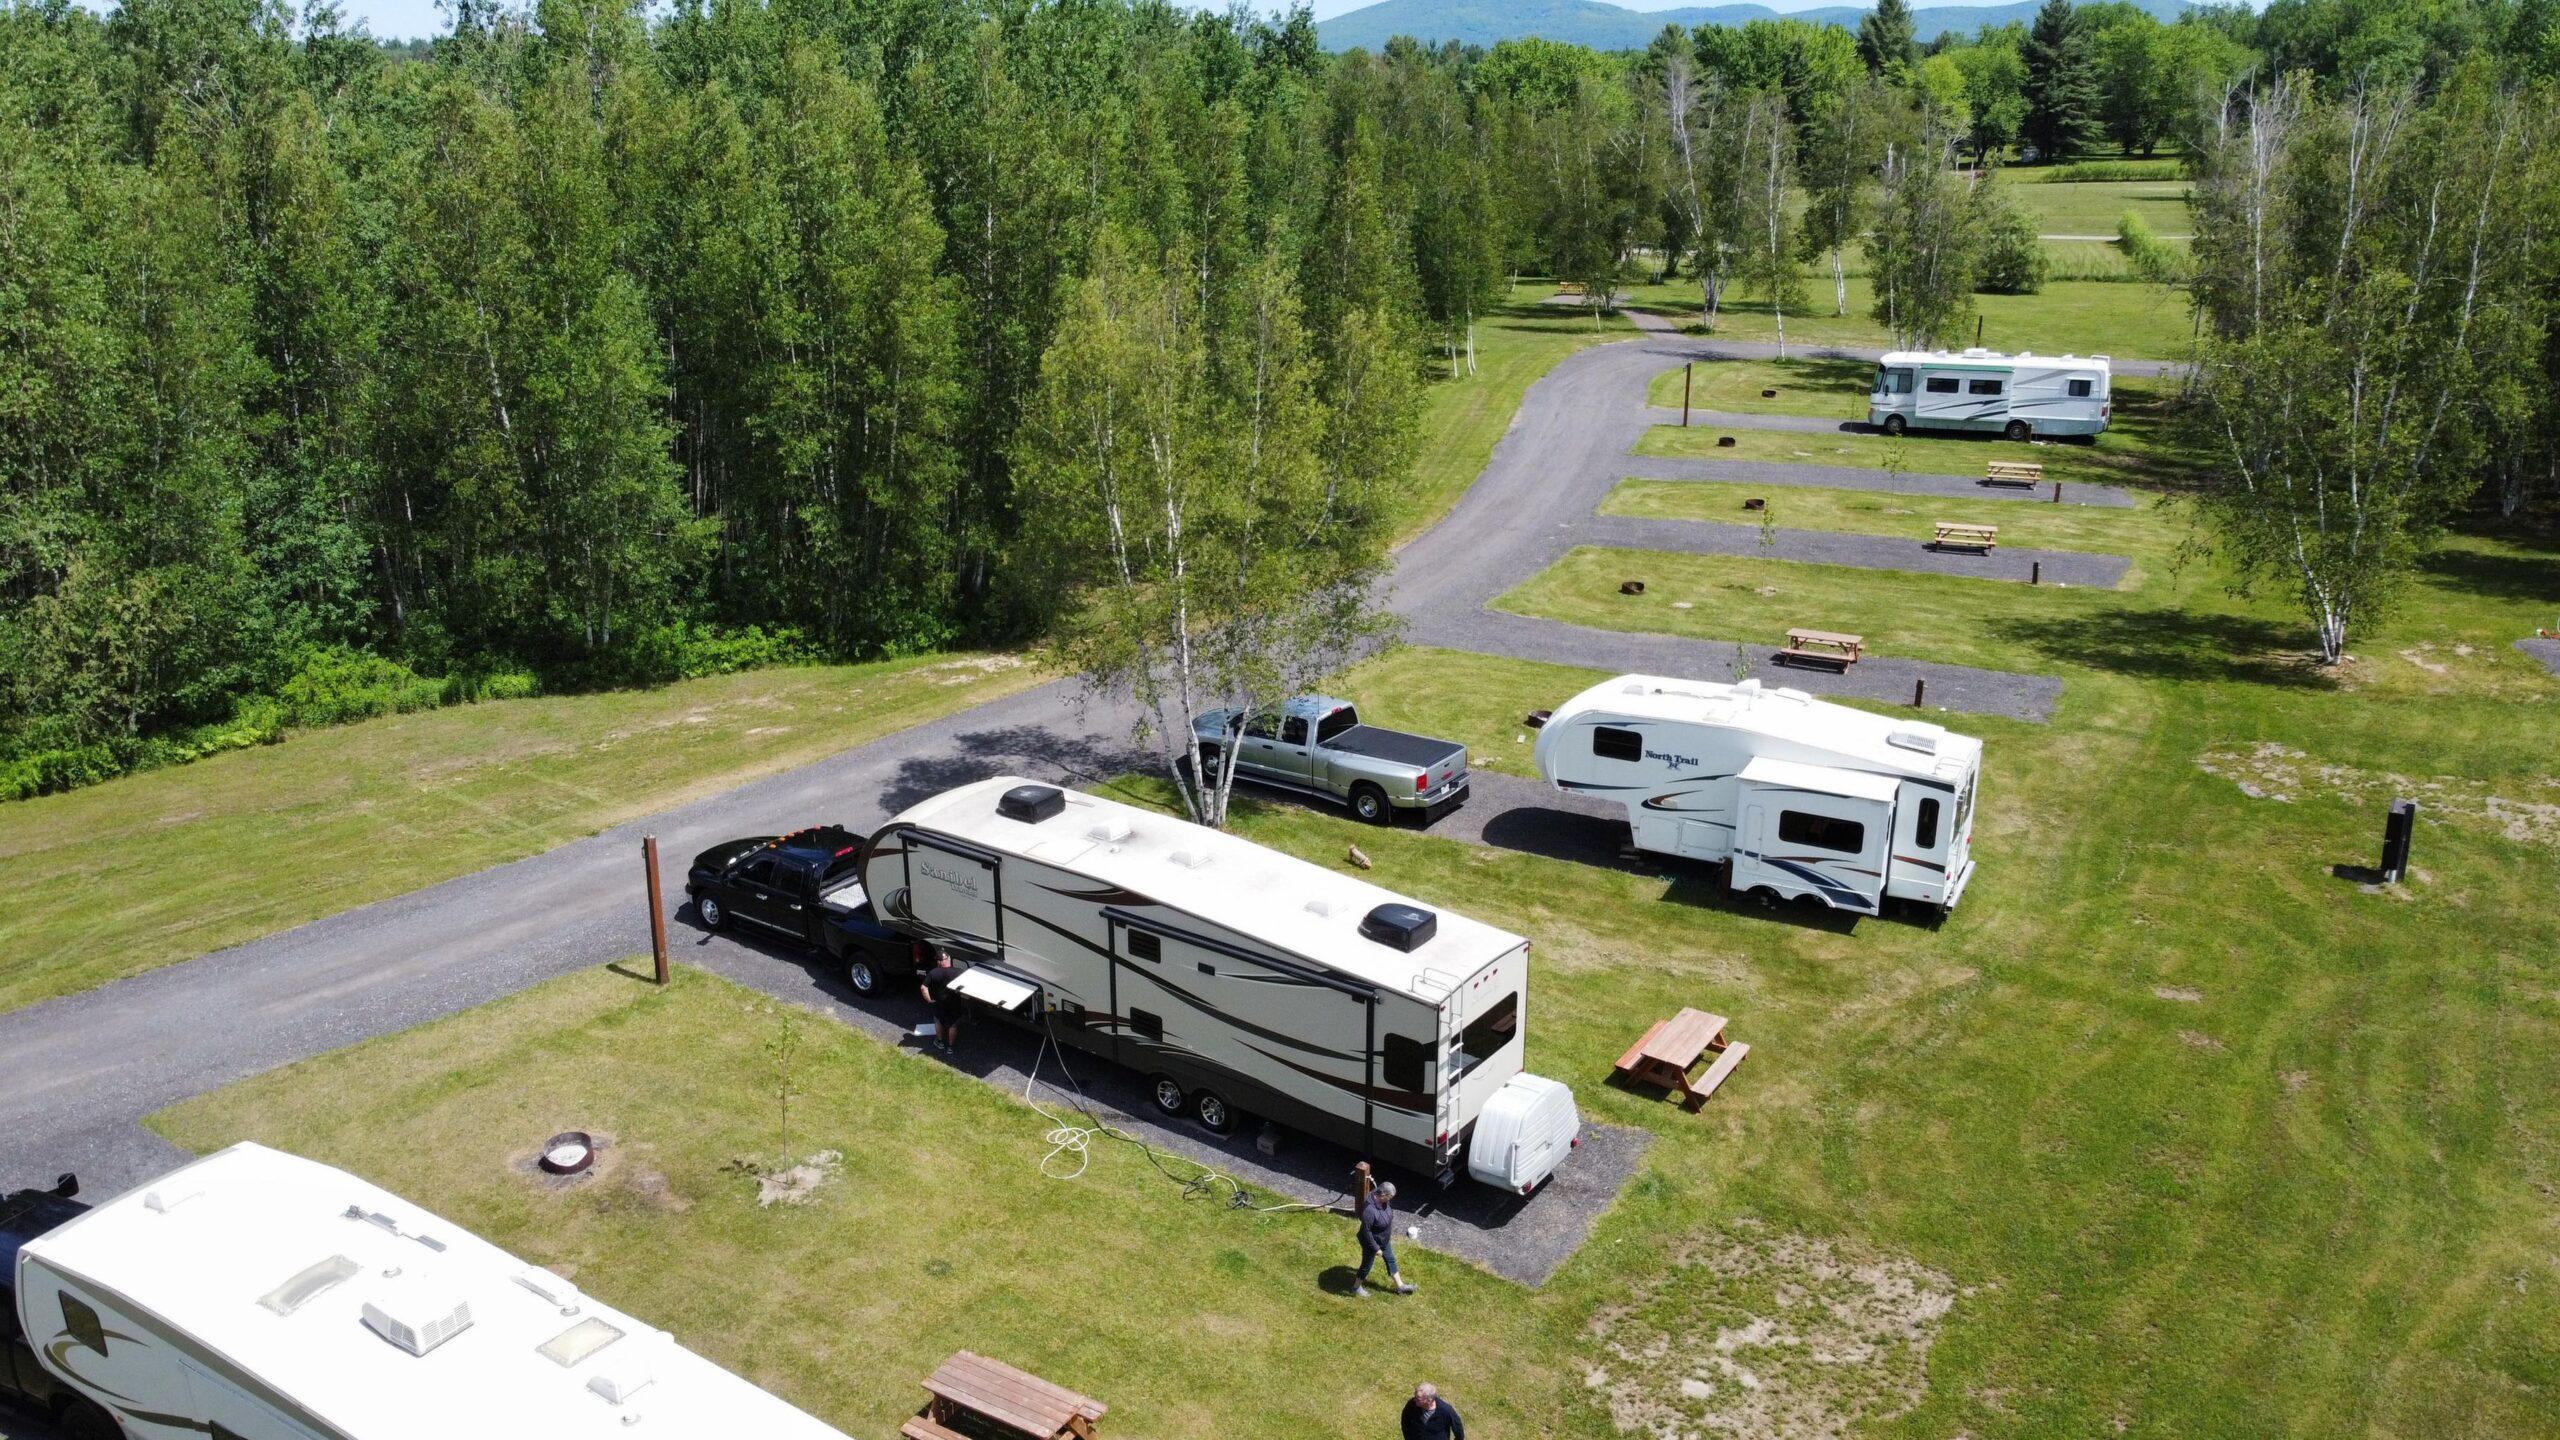 camping_vue aérienne 3